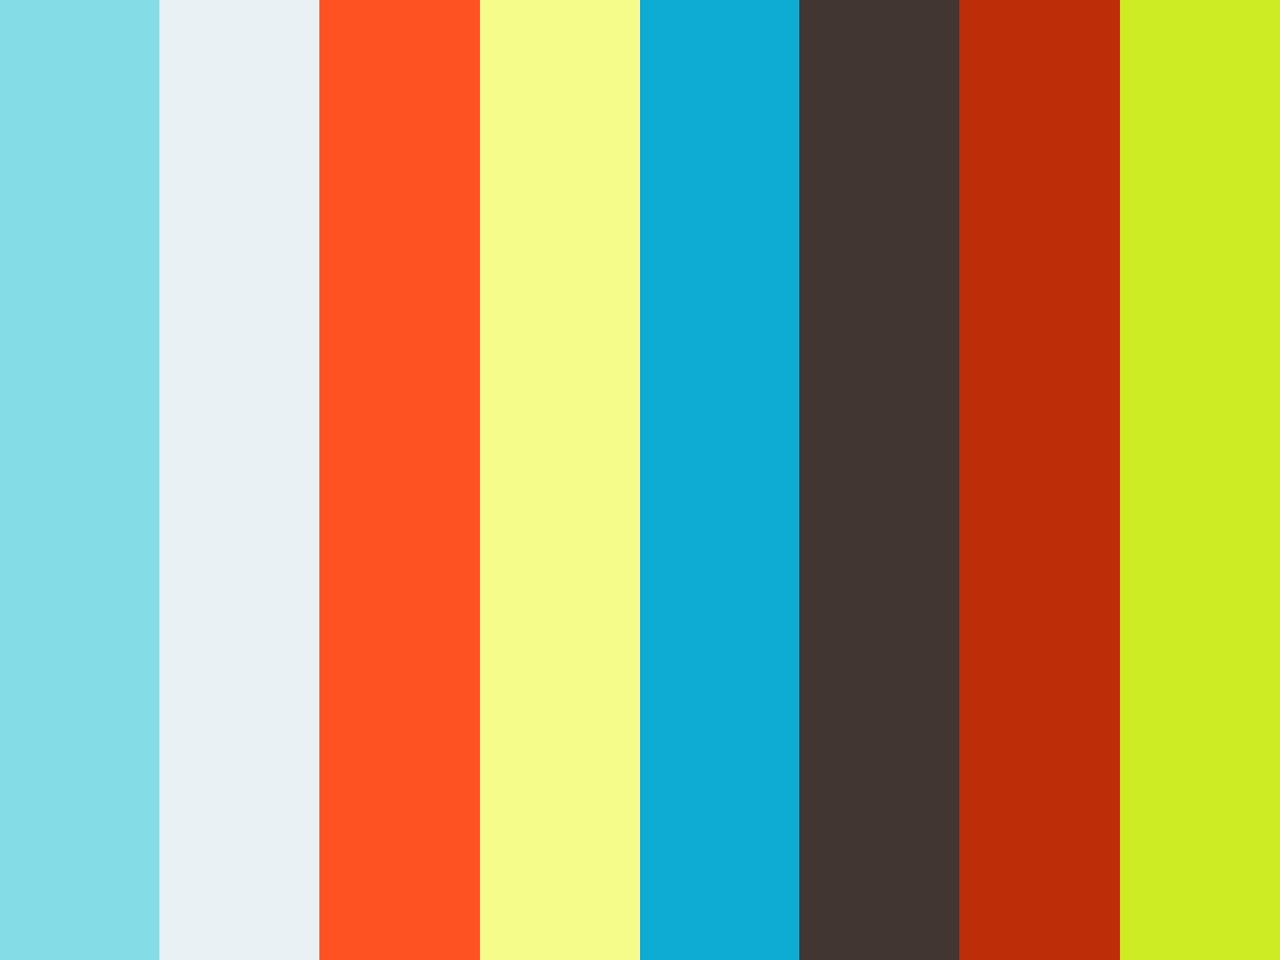 #TheJoyOfMaking – Production Design – Version 2